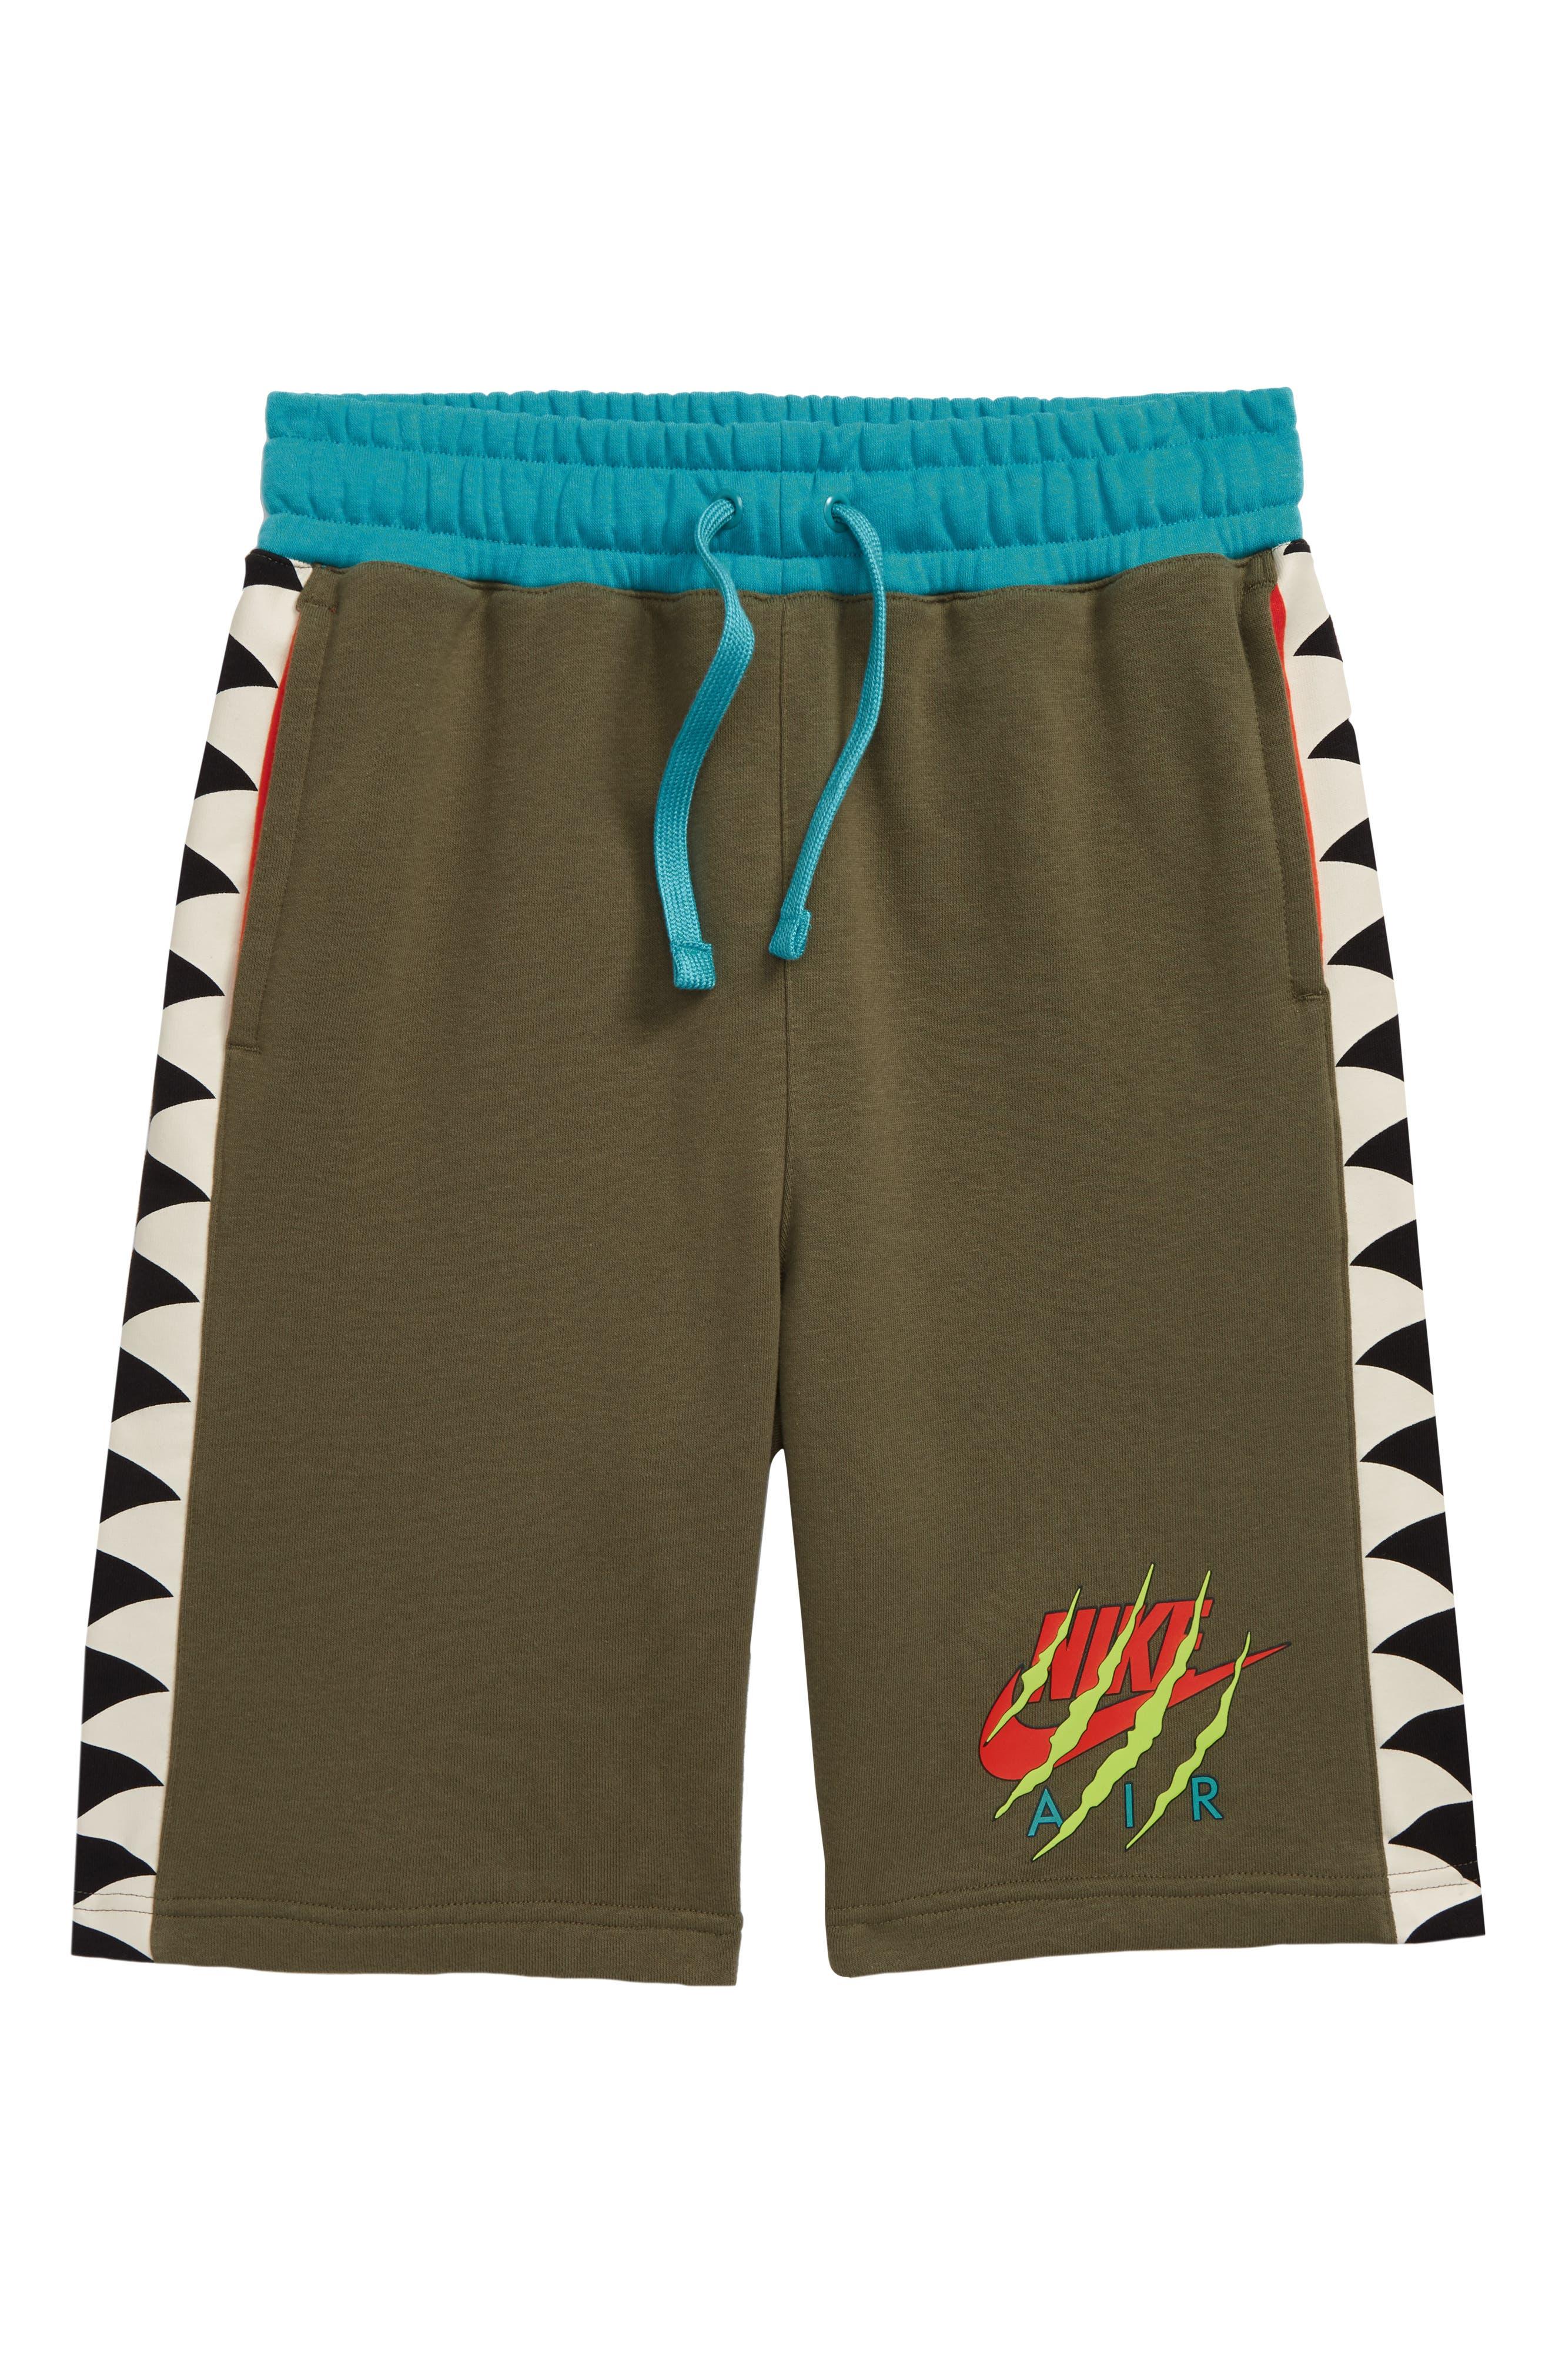 Boys Nike Sportswear Jurassic Shorts